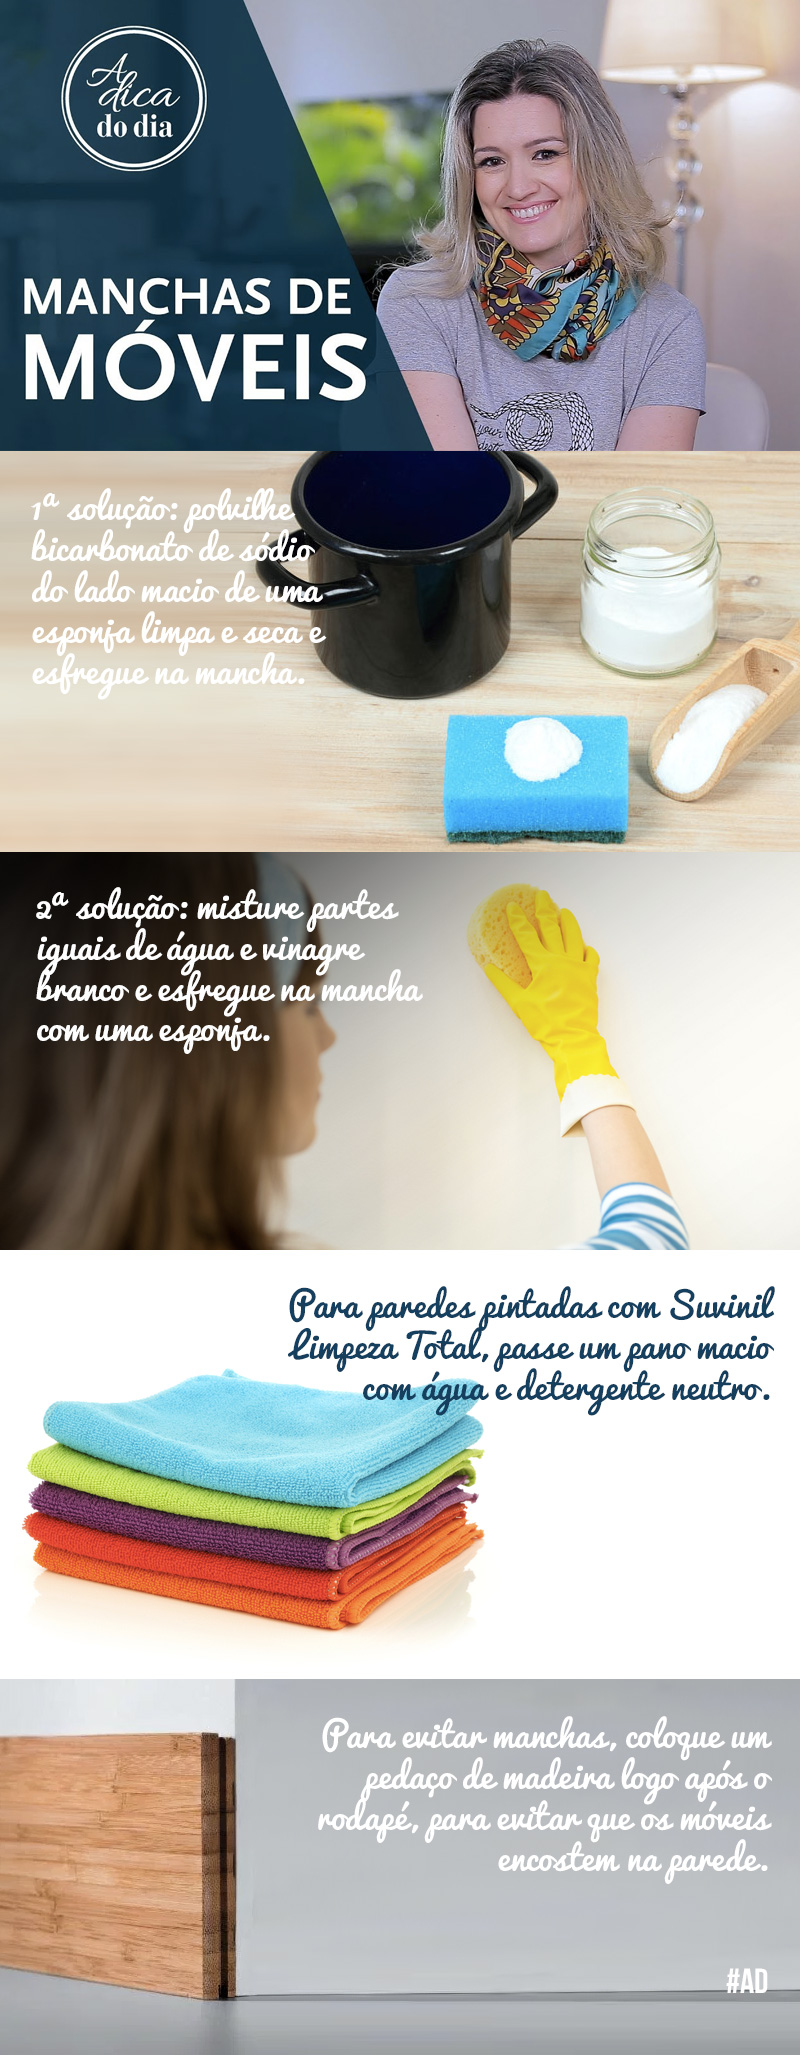 retirar manchas de moveis na parede